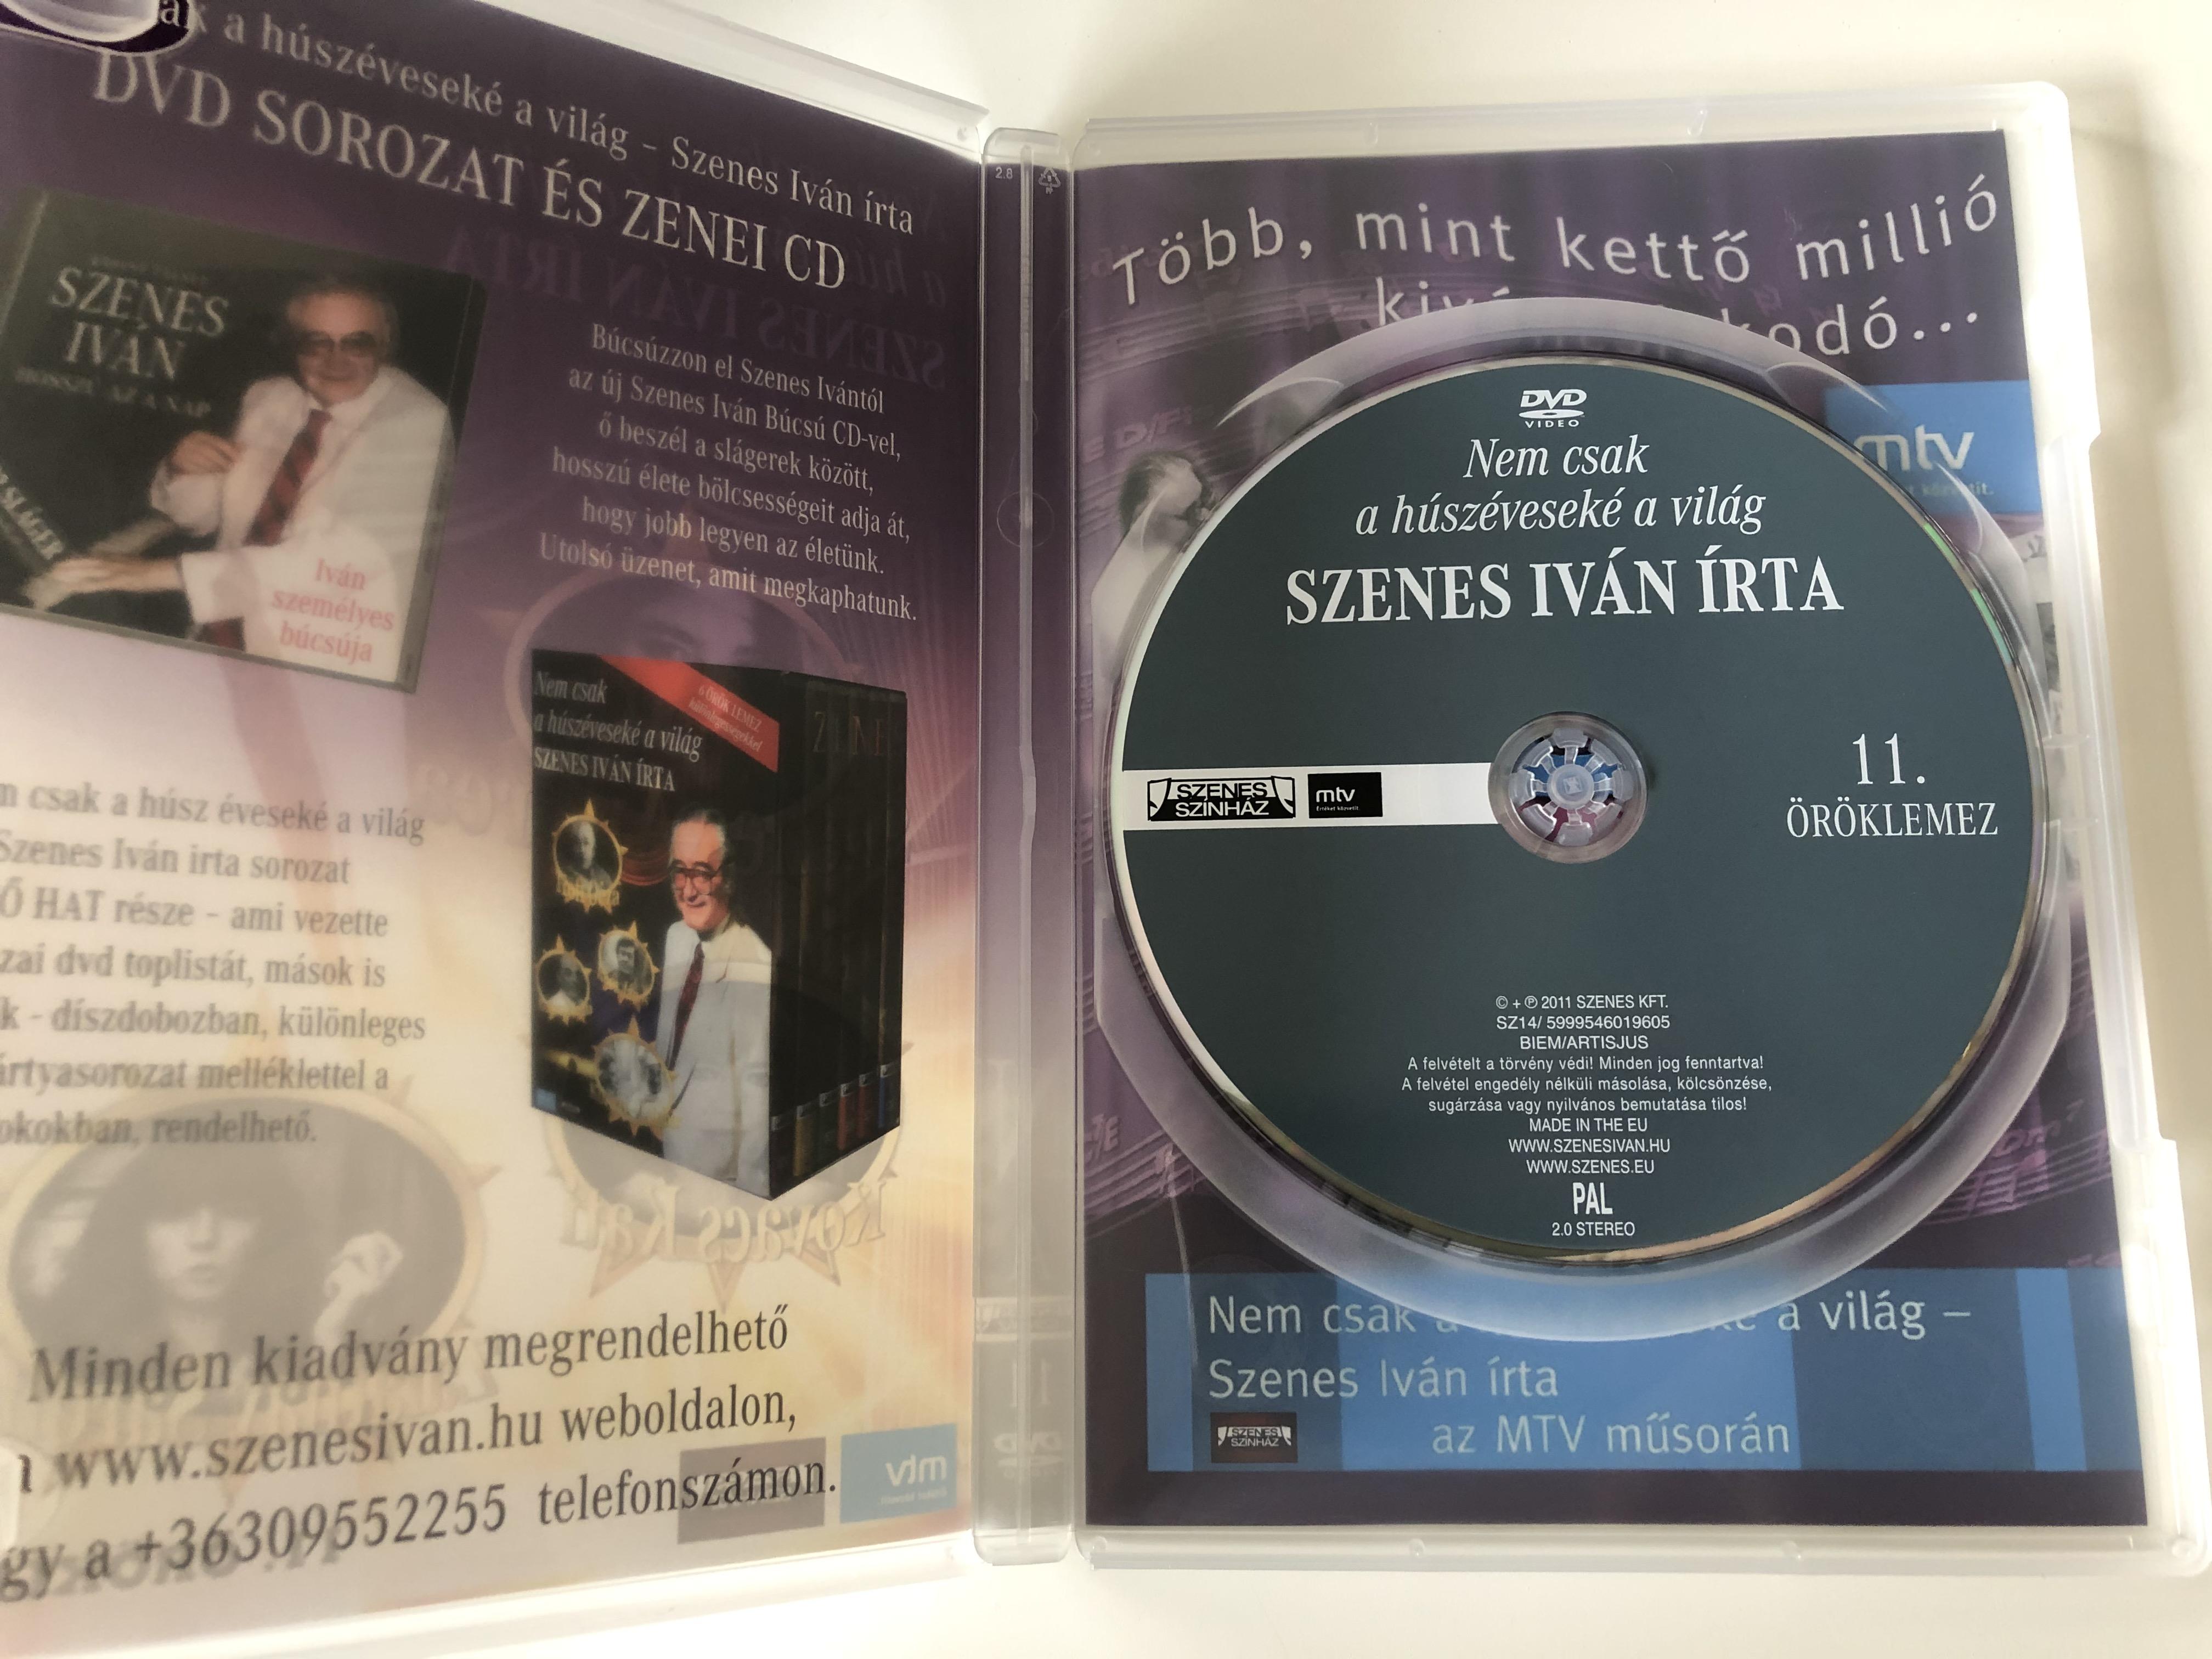 -nem-csak-a-h-sz-vesek-a-vil-g-dvd-2011-11.-r-klemez-2.jpg